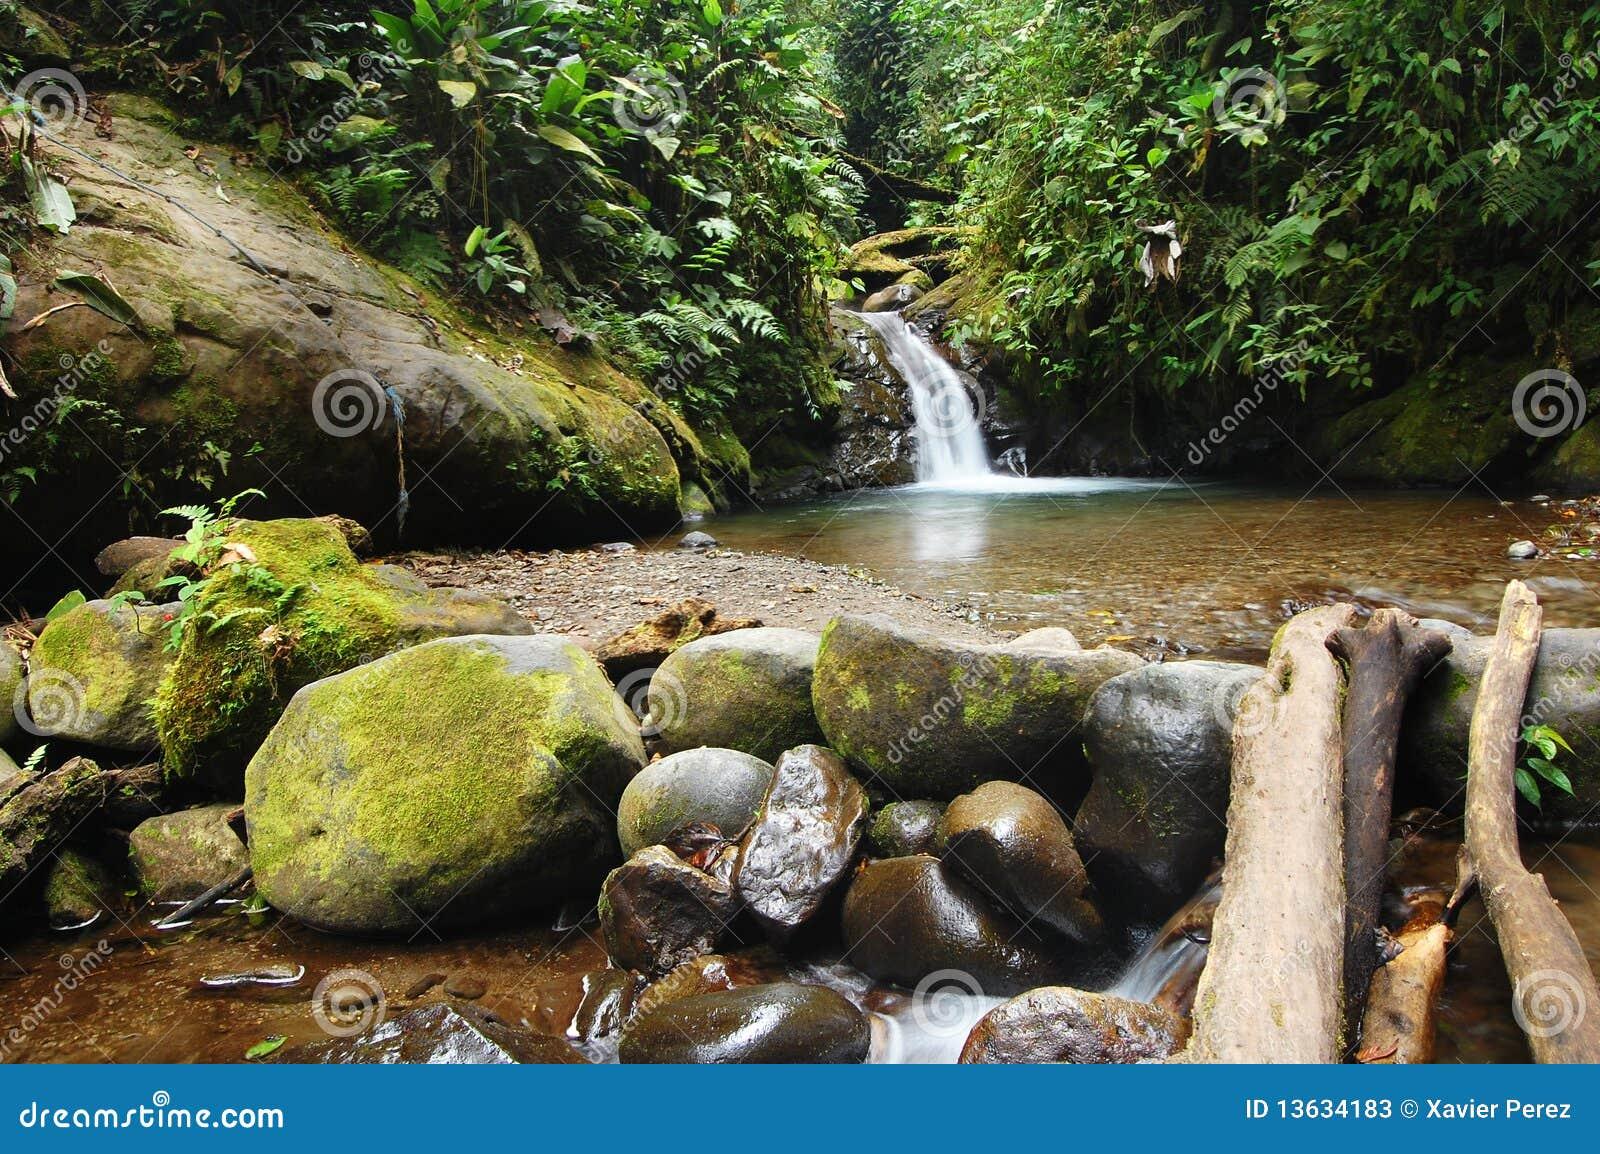 natural spring waterfall stock image image of mindo 13634183